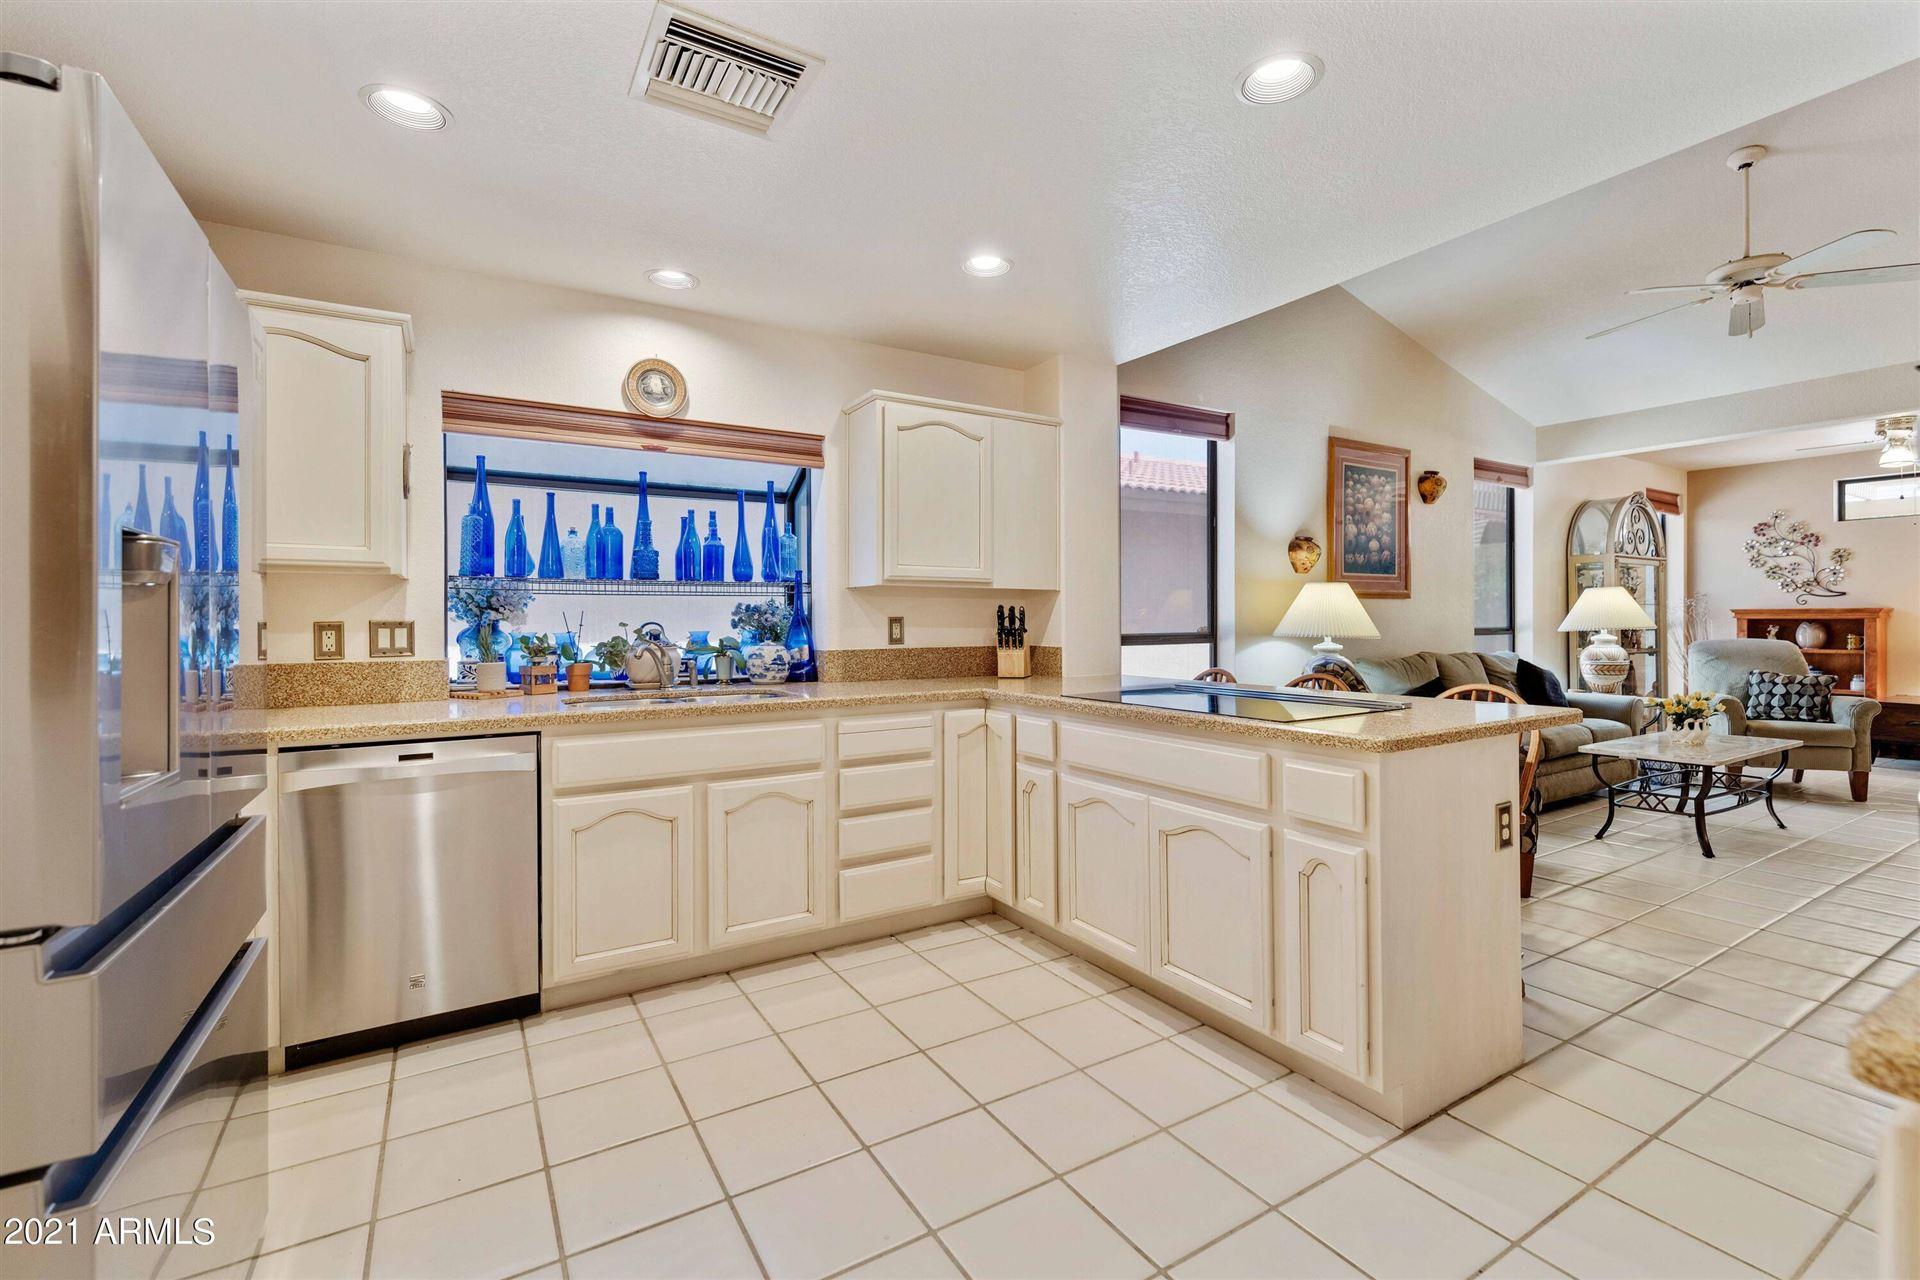 Photo of 25620 S BRENTWOOD Drive, Sun Lakes, AZ 85248 (MLS # 6267234)